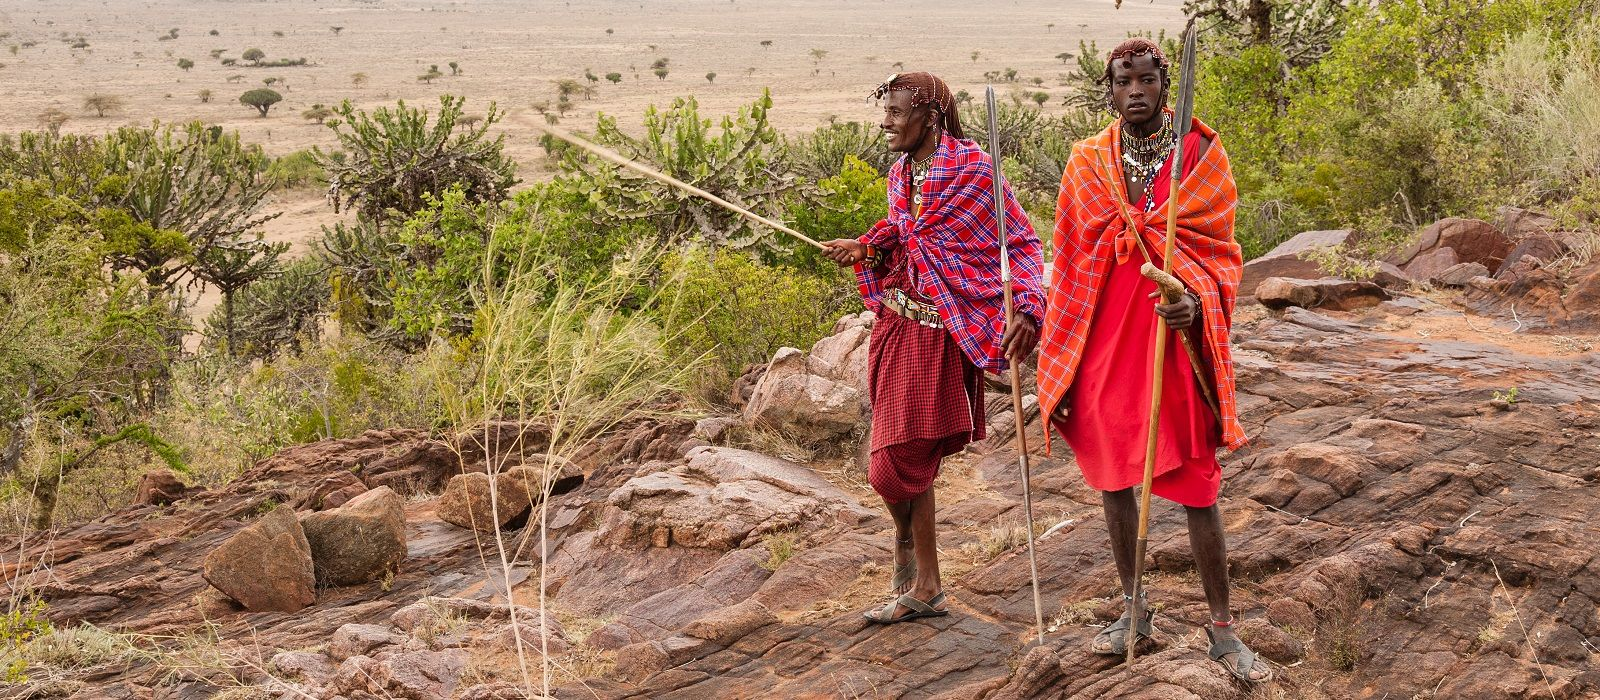 Atua Enkop Exclusive: Kenya Safari and Beach Break Tour Trip 6